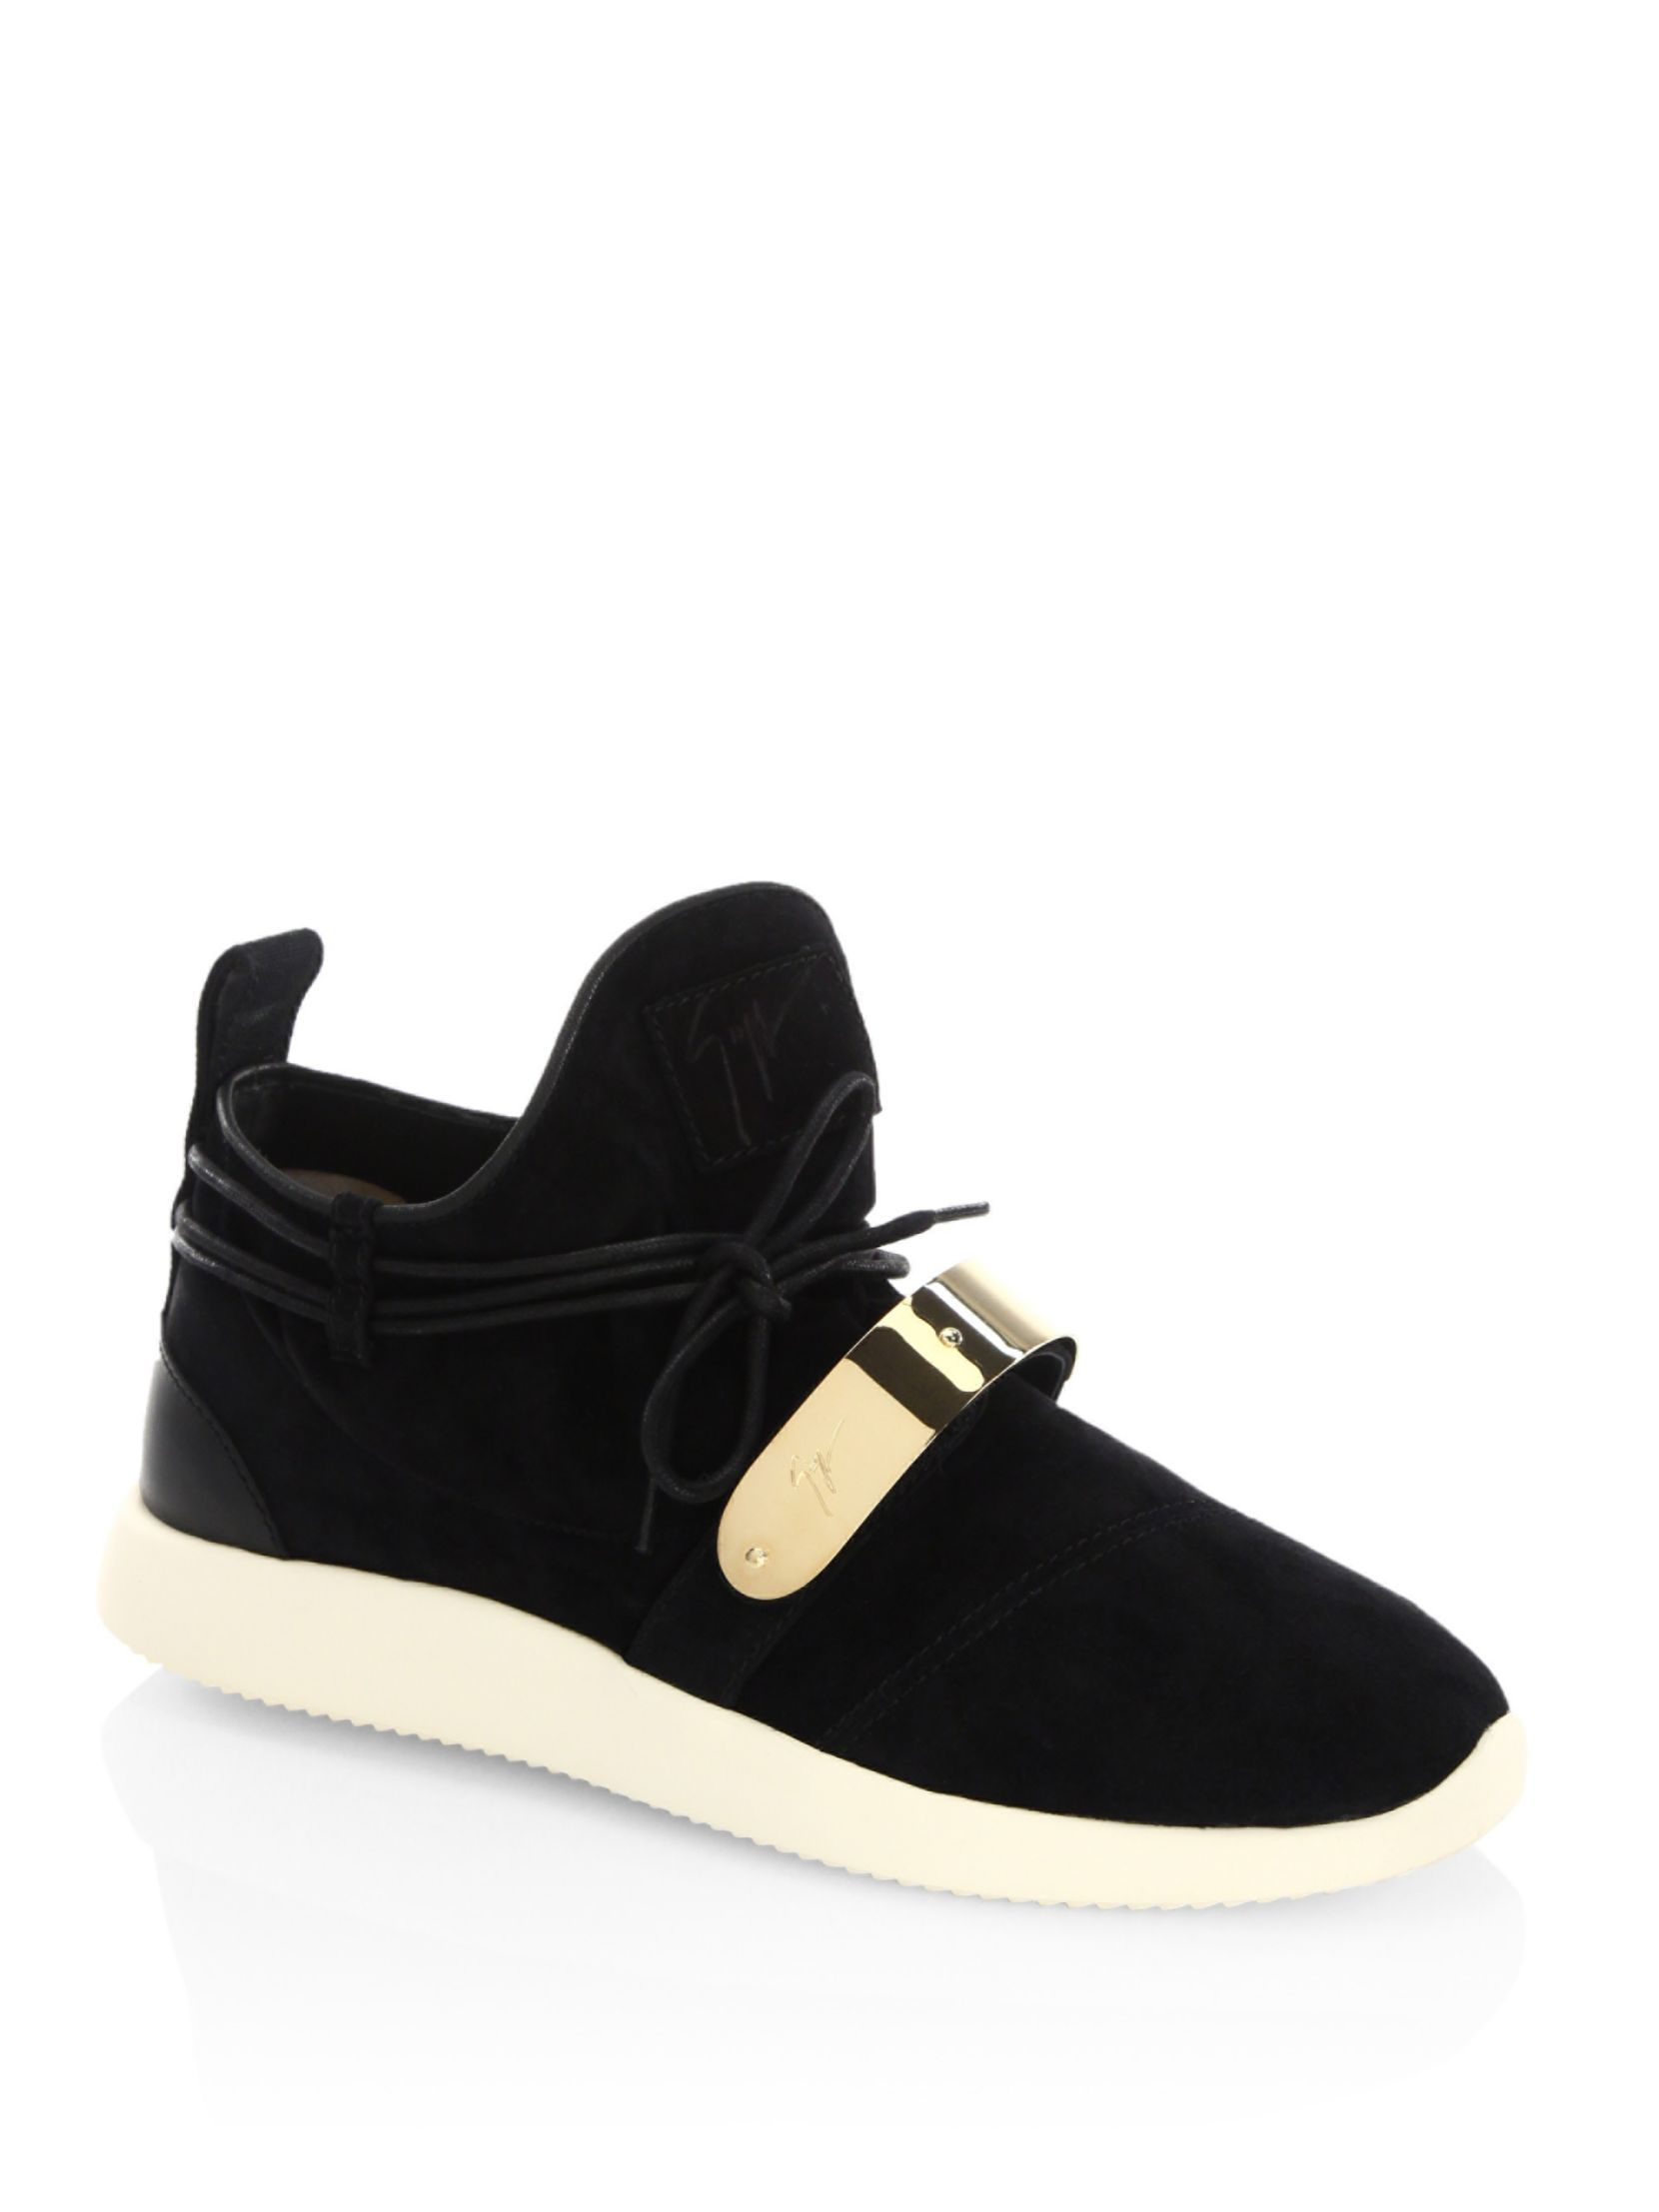 Giuseppe Zanotti Suede Singleg Sneakers ItcjmnLtVZ